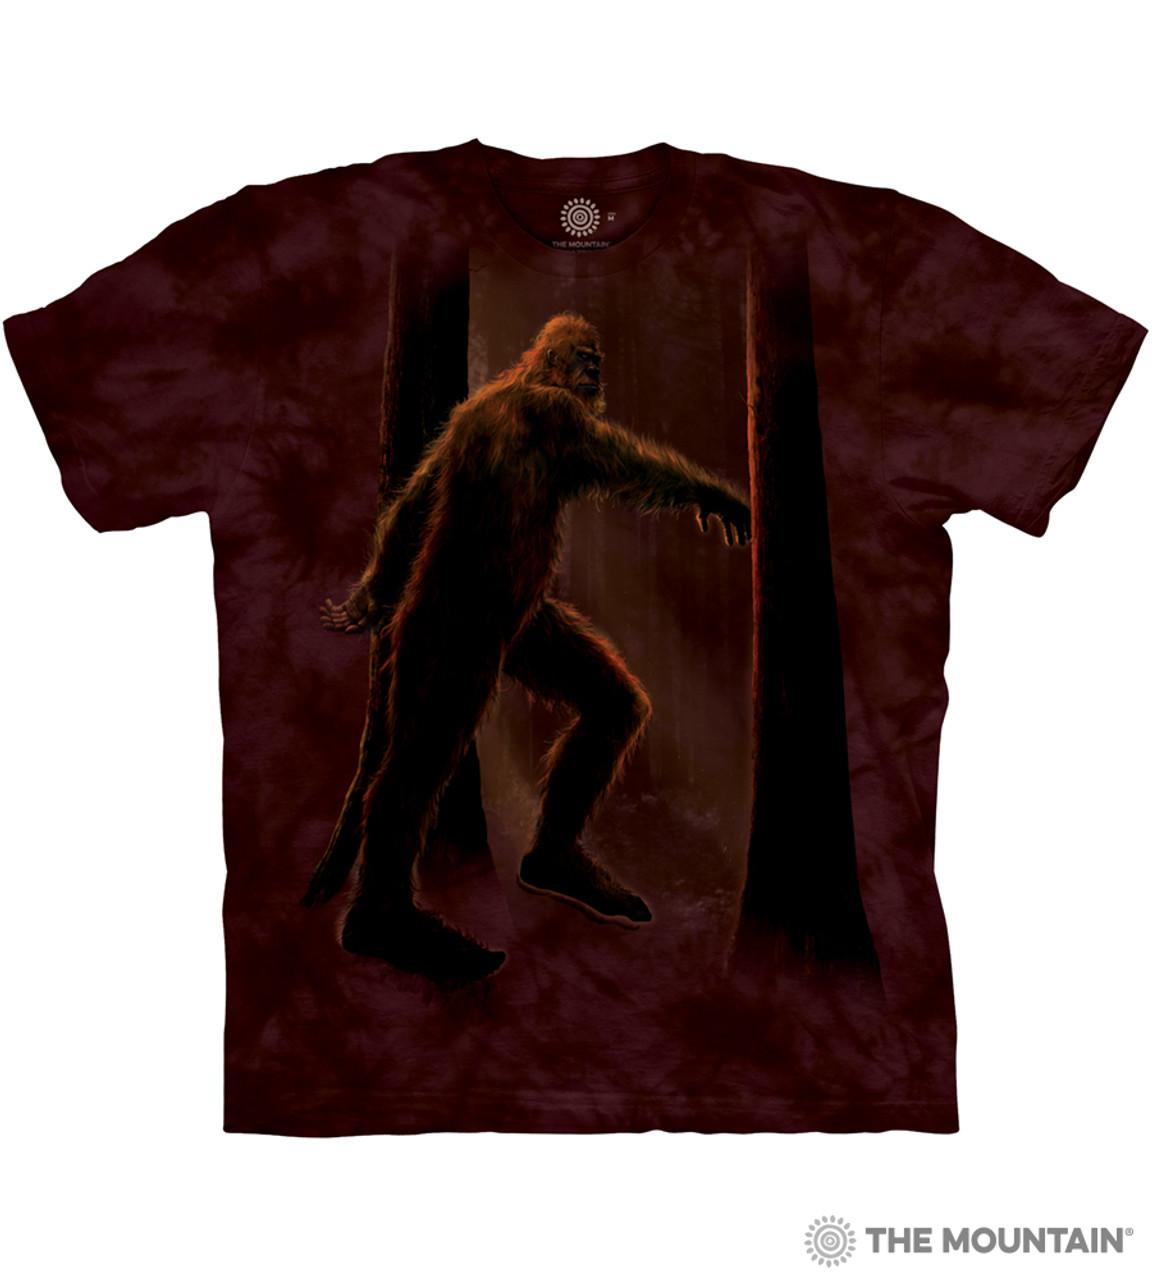 The Mountain Bigfoot Sasquatch Woods Moonlight T-Shirt Adult Unisex Sizes S-3XL